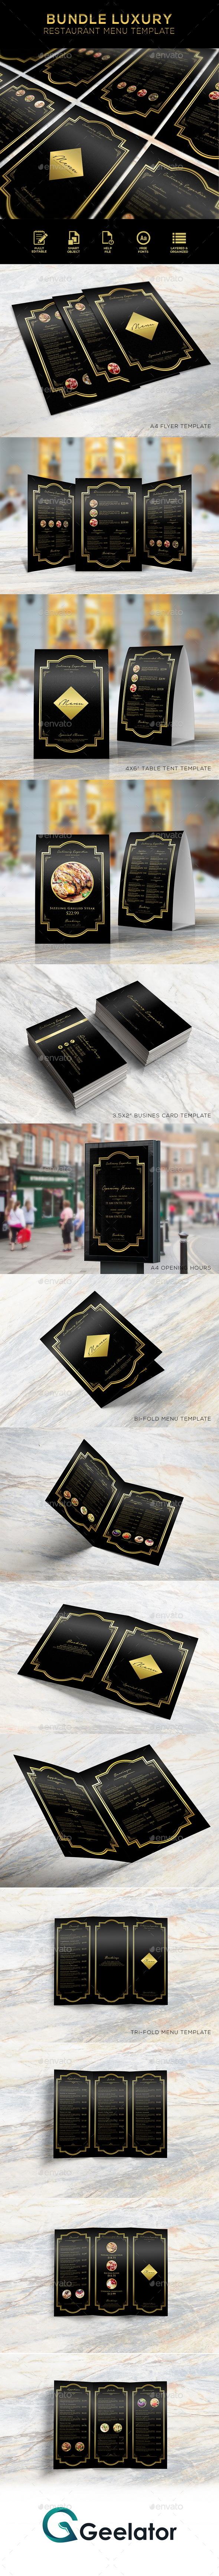 Bundle Luxury Restaurant Menu Template - Food Menus Print Templates